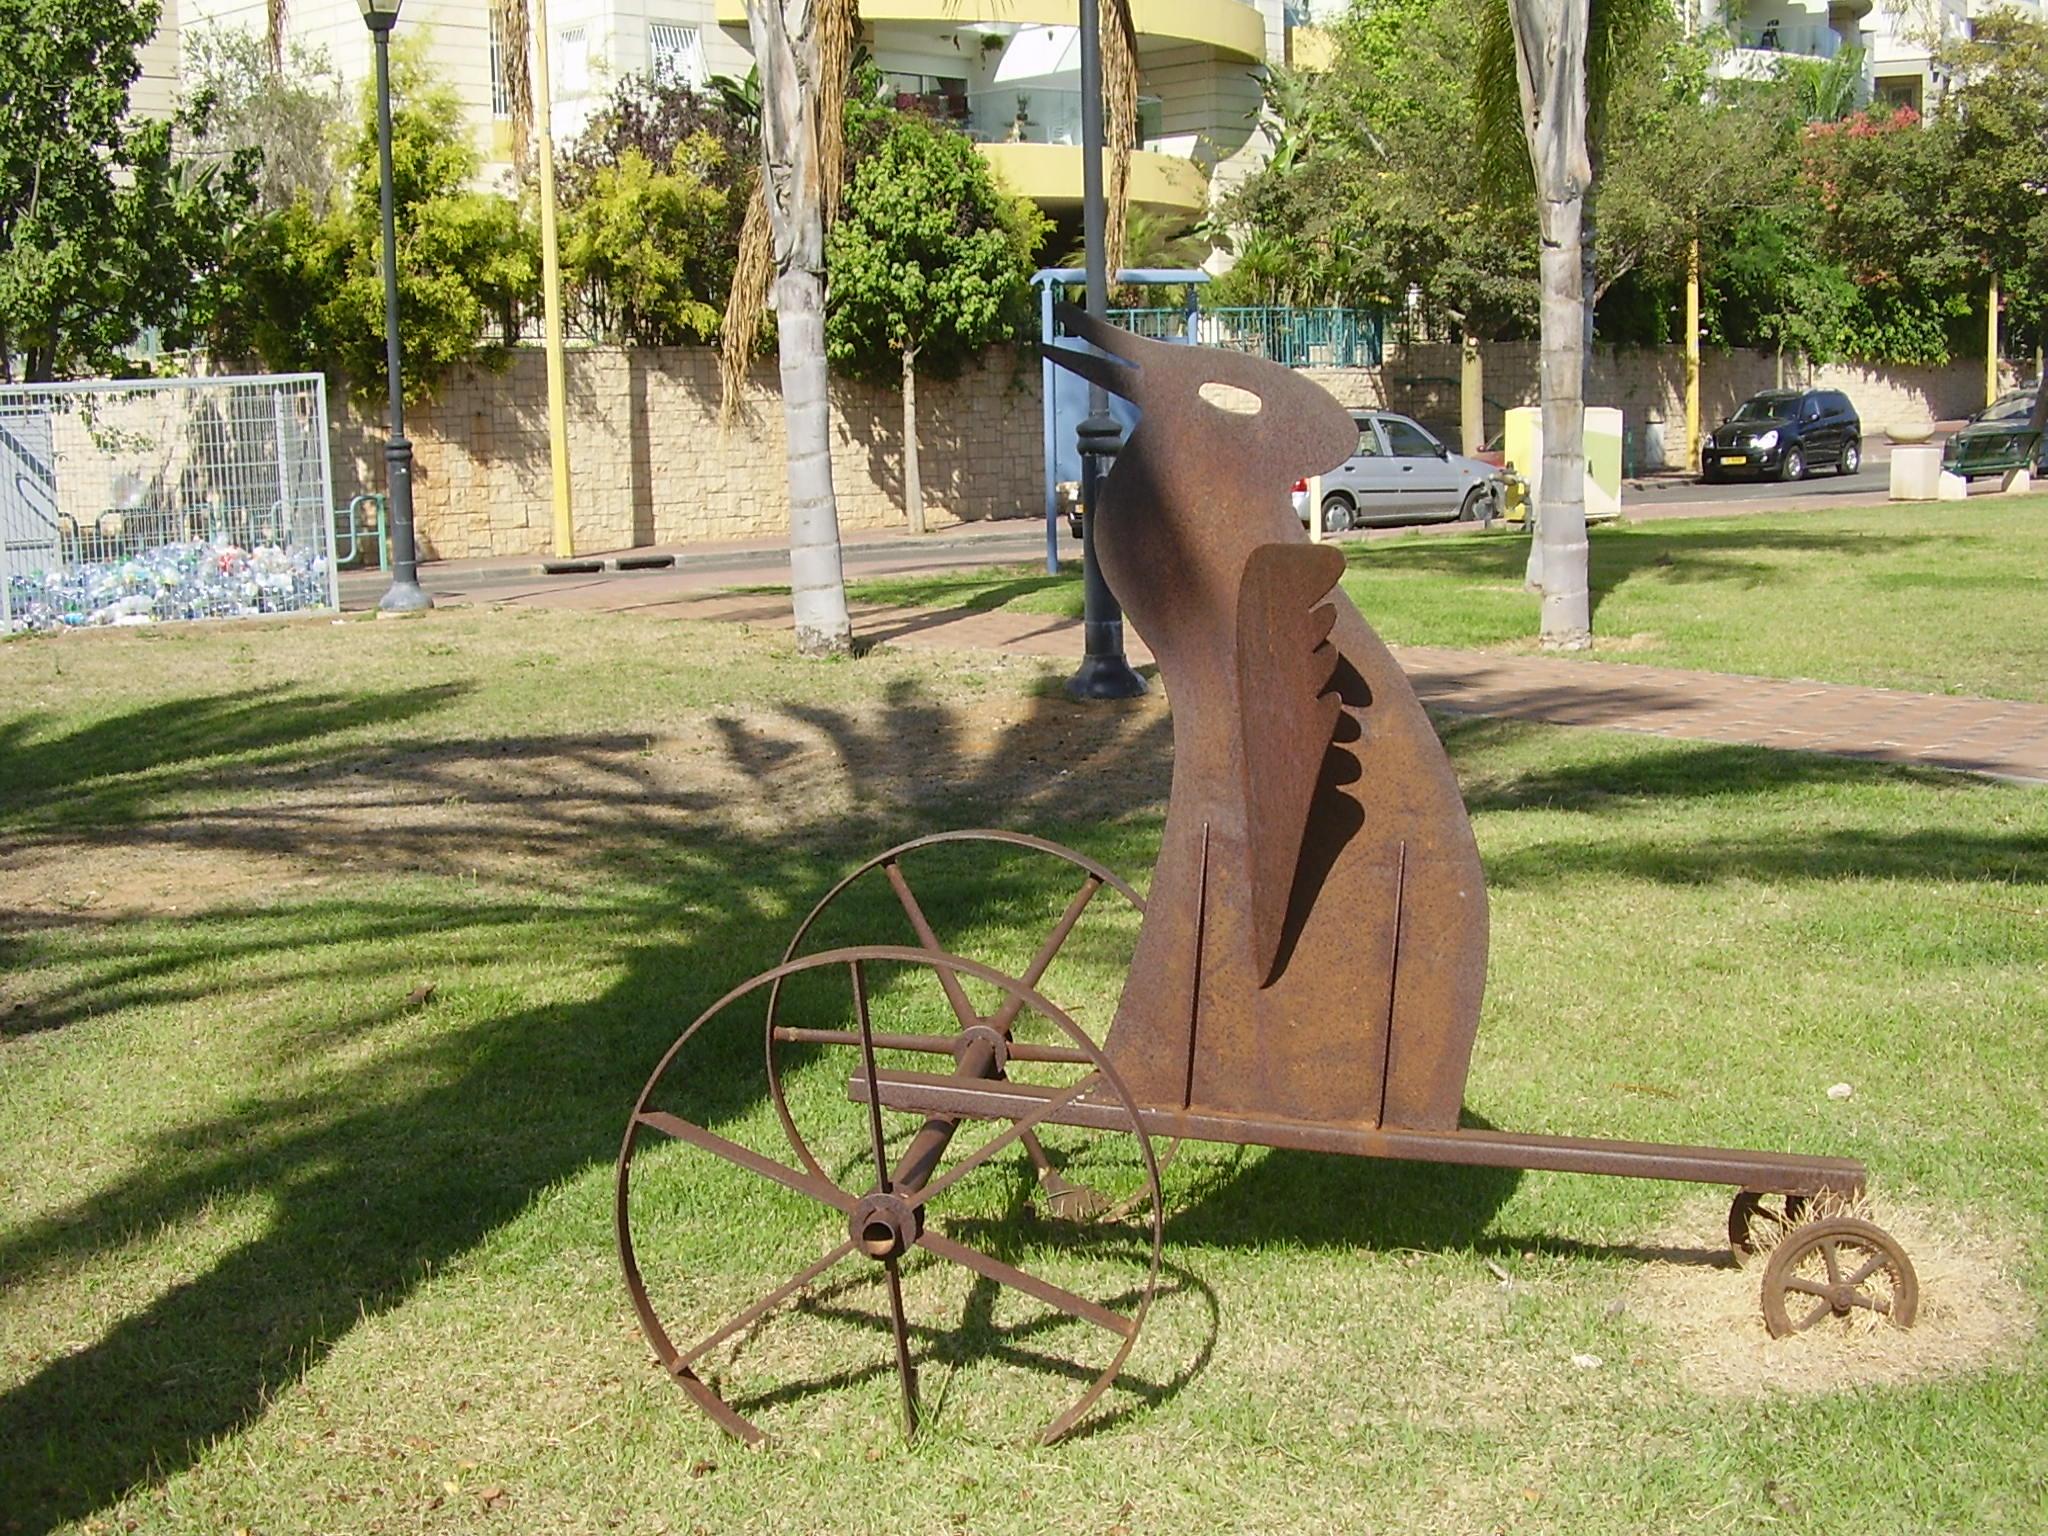 Gentil File:PikiWiki Israel 9977 Iron Sculpture Garden In Ganei Tikva